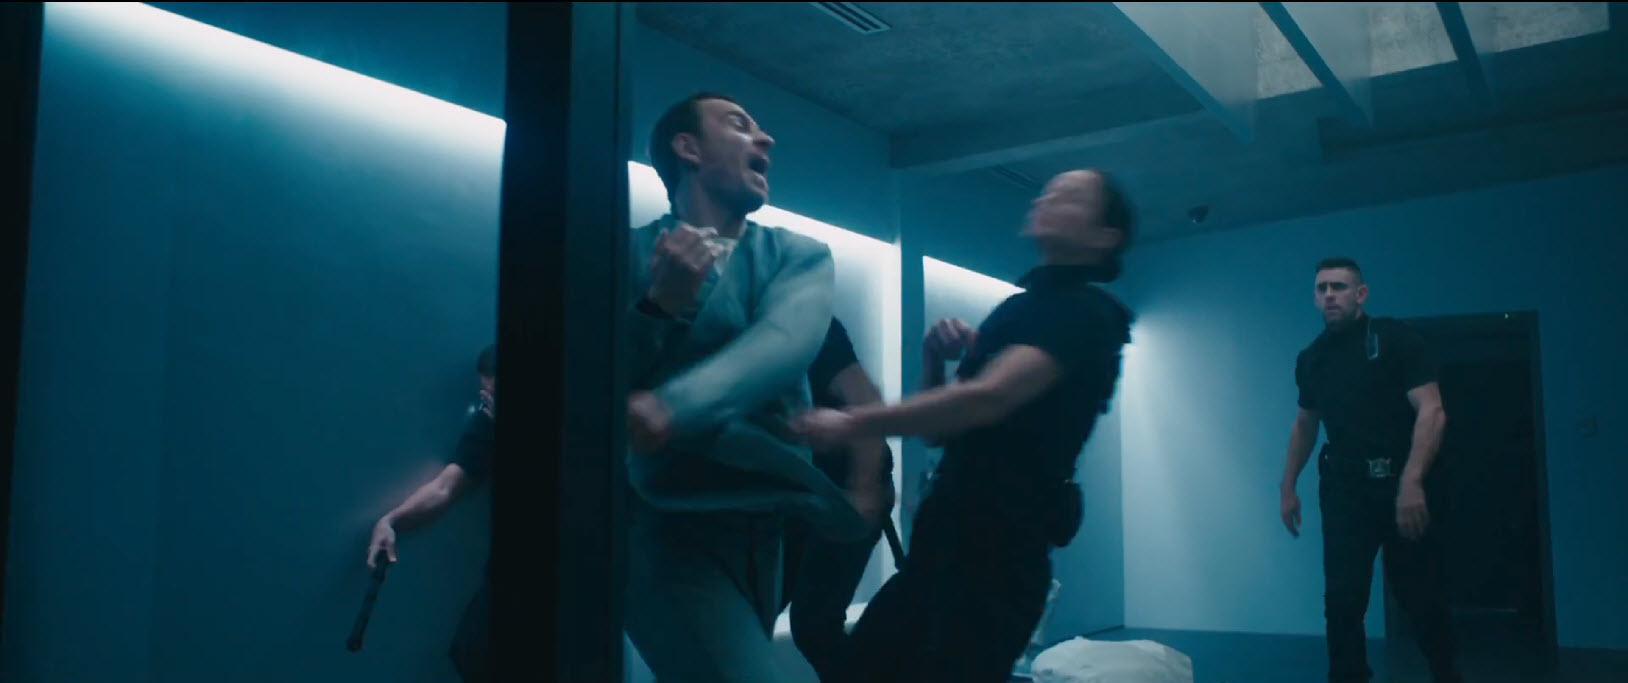 new assassins creed trailer brings on fassbender hidden blade action 2016 images